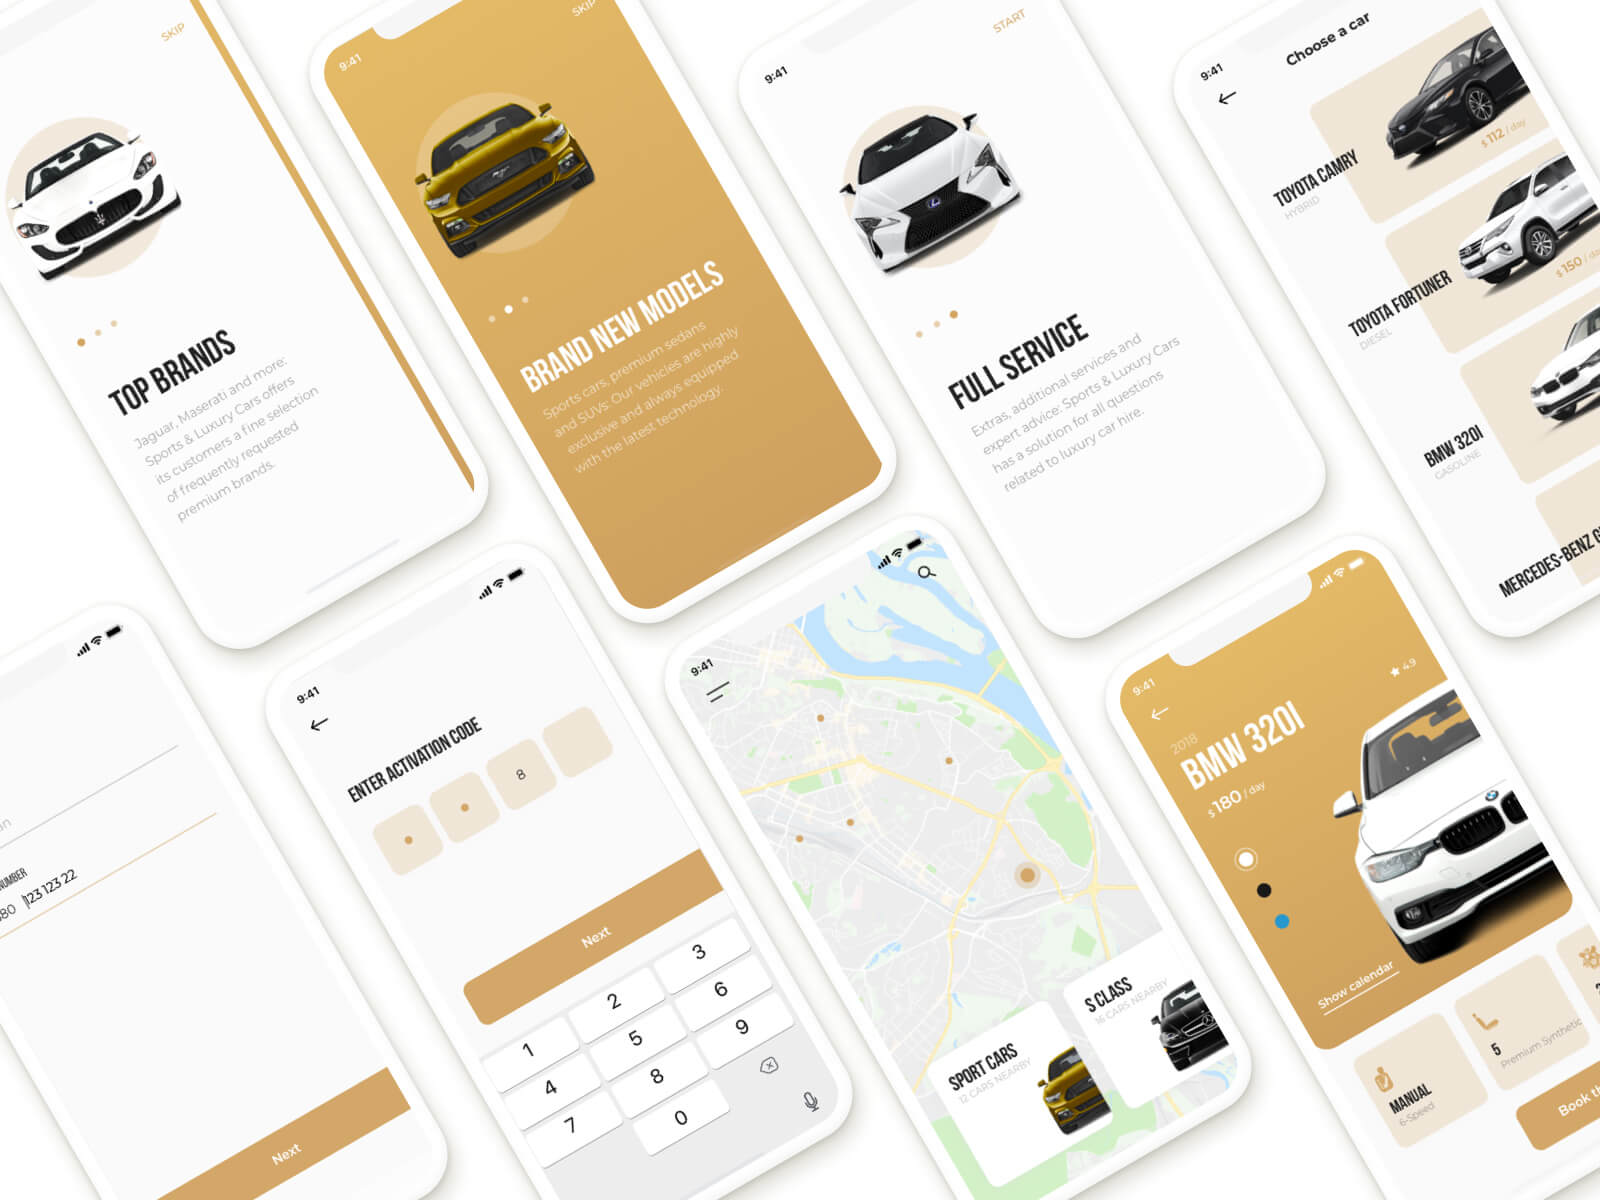 Car rental IOS app cover image